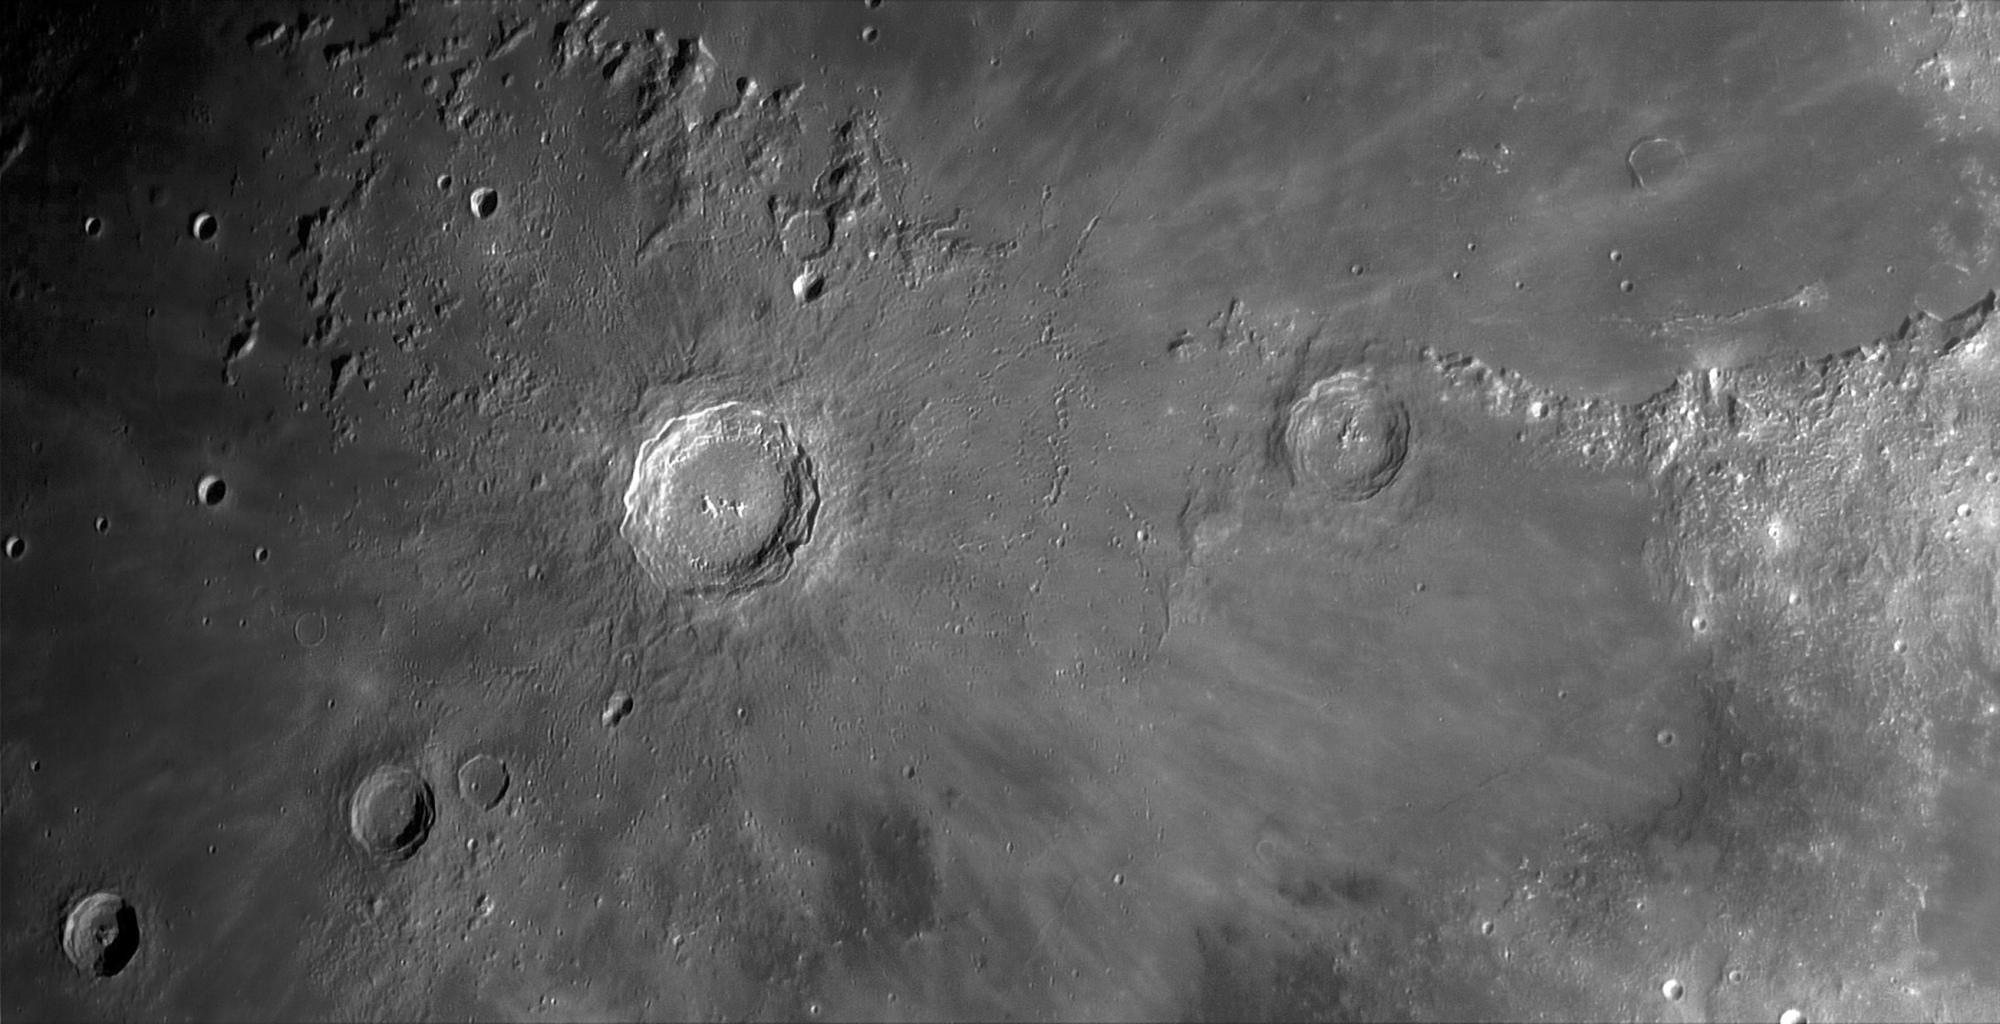 20201125-Copernic.thumb.jpg.4d1d38da74c905ef9bc9d021084efb25.jpg